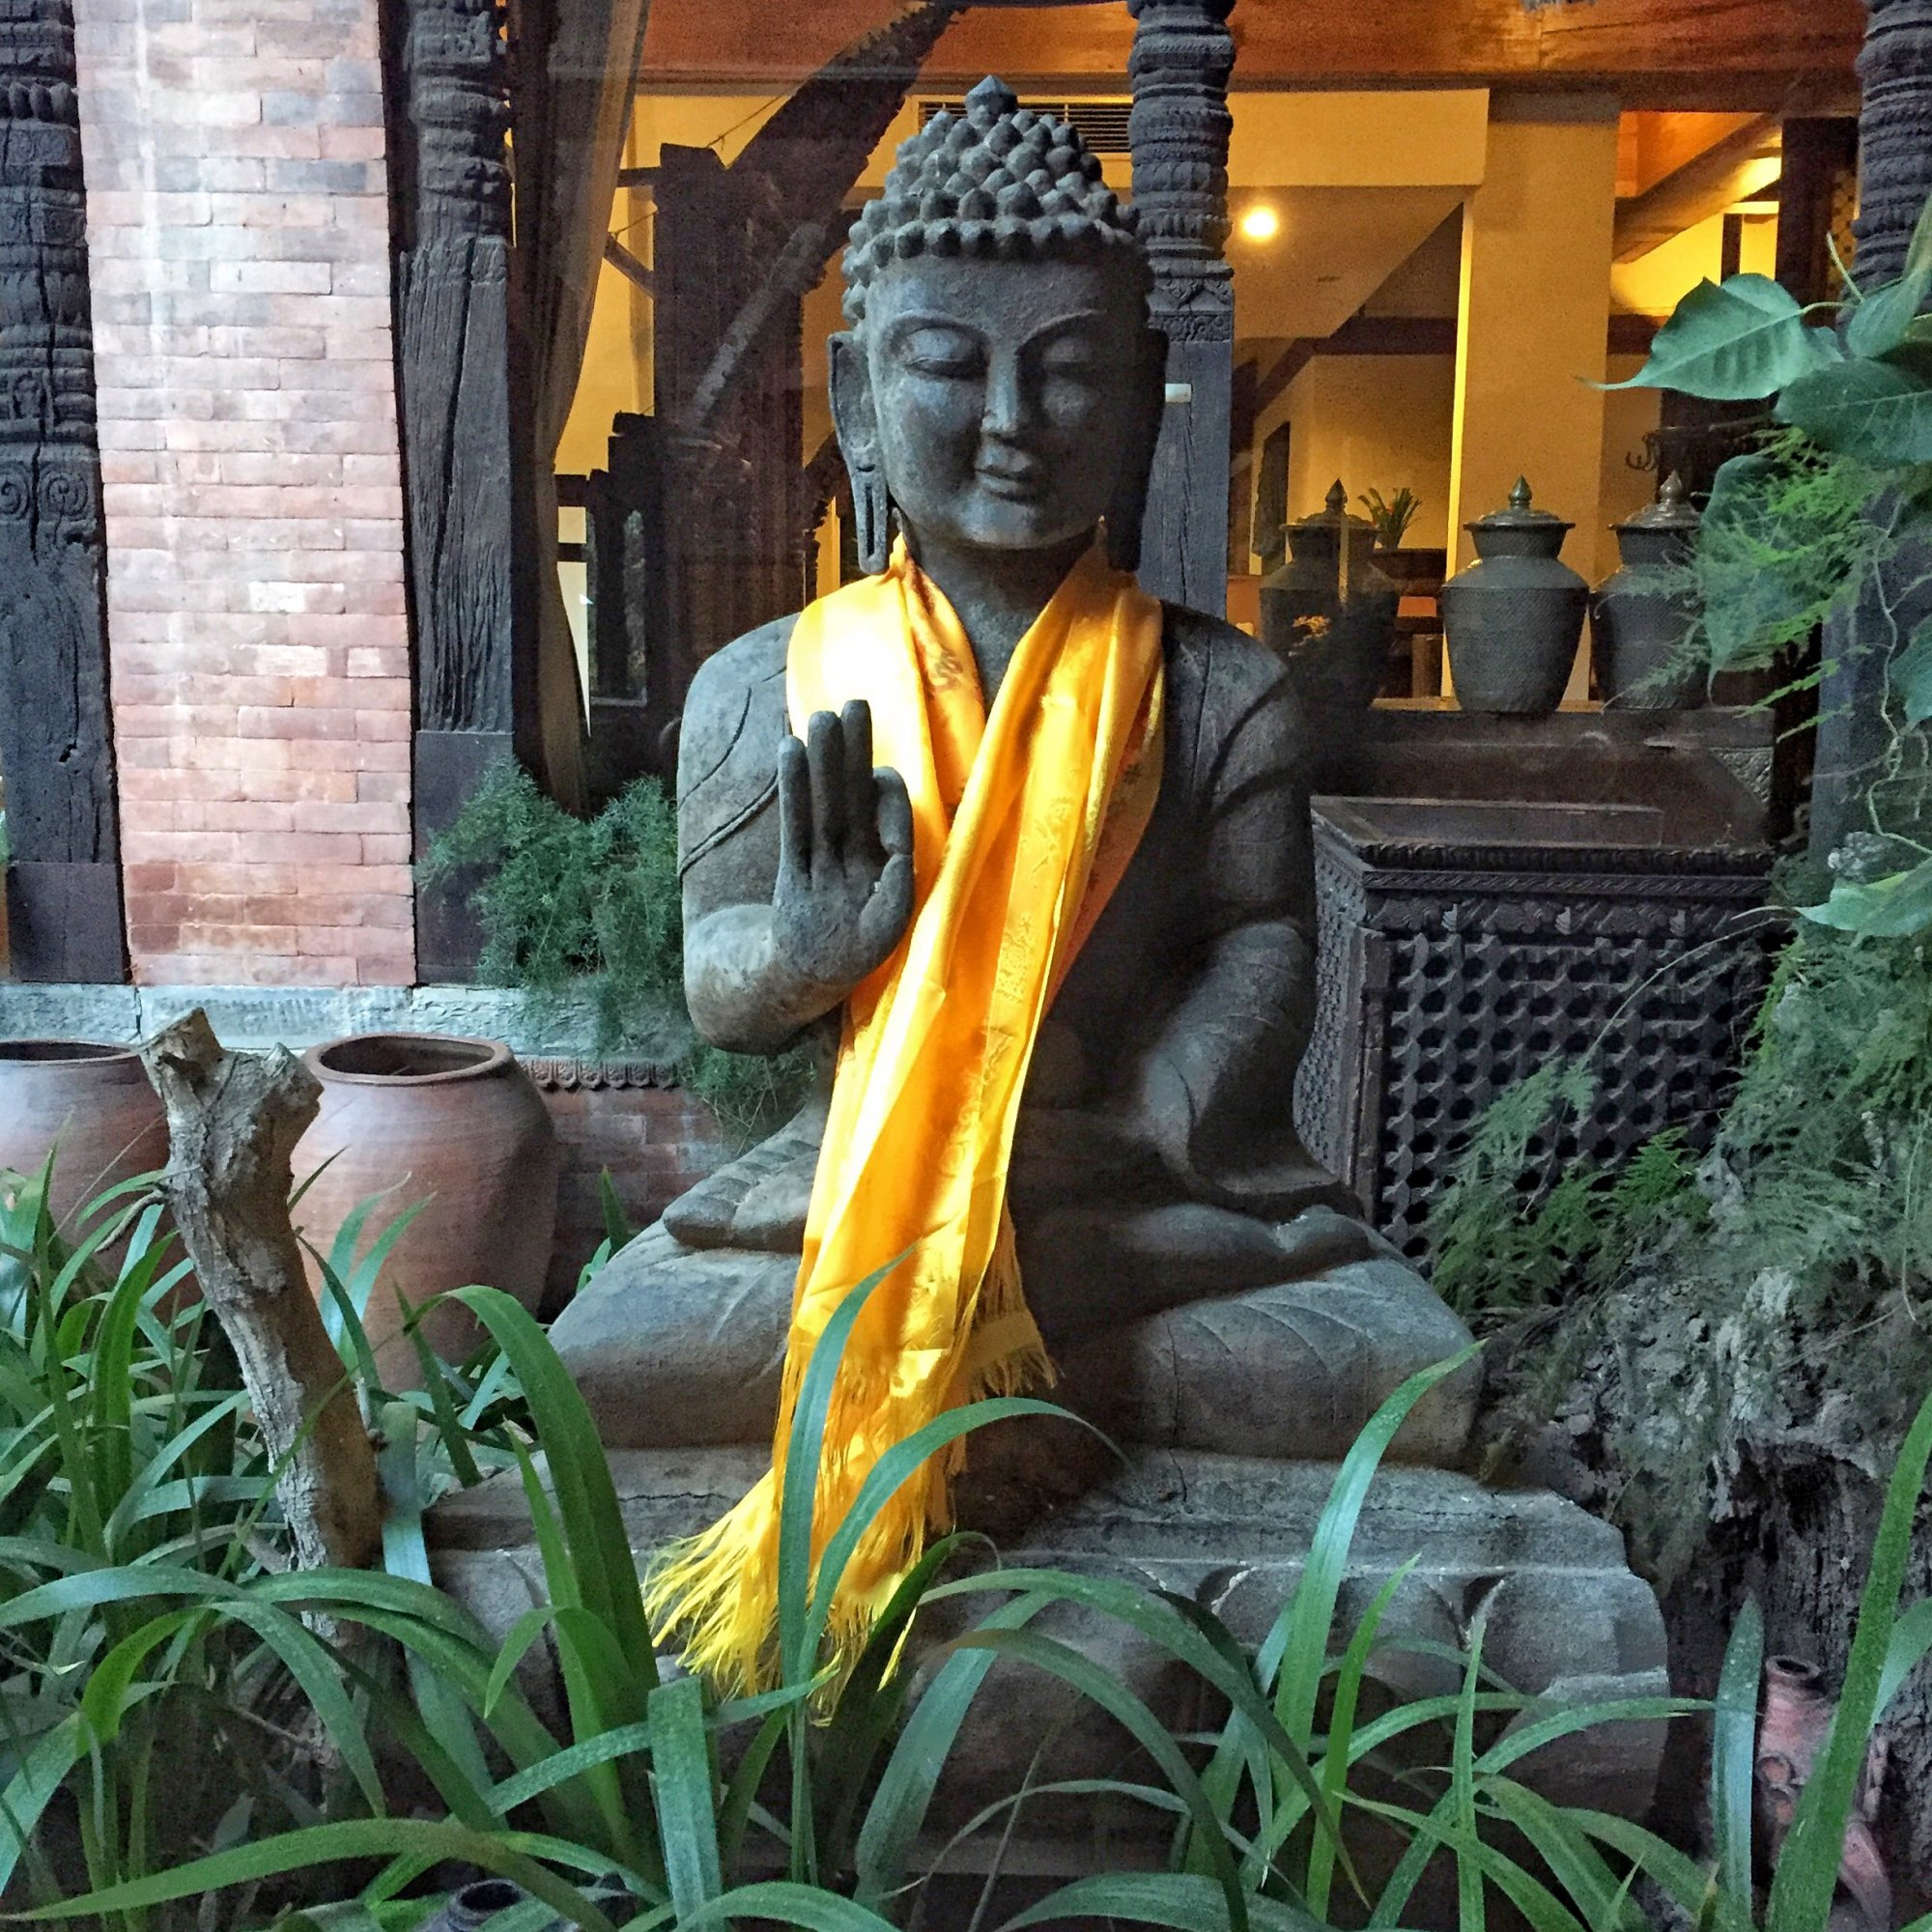 Dwarika's Hotel in Kathmandu.